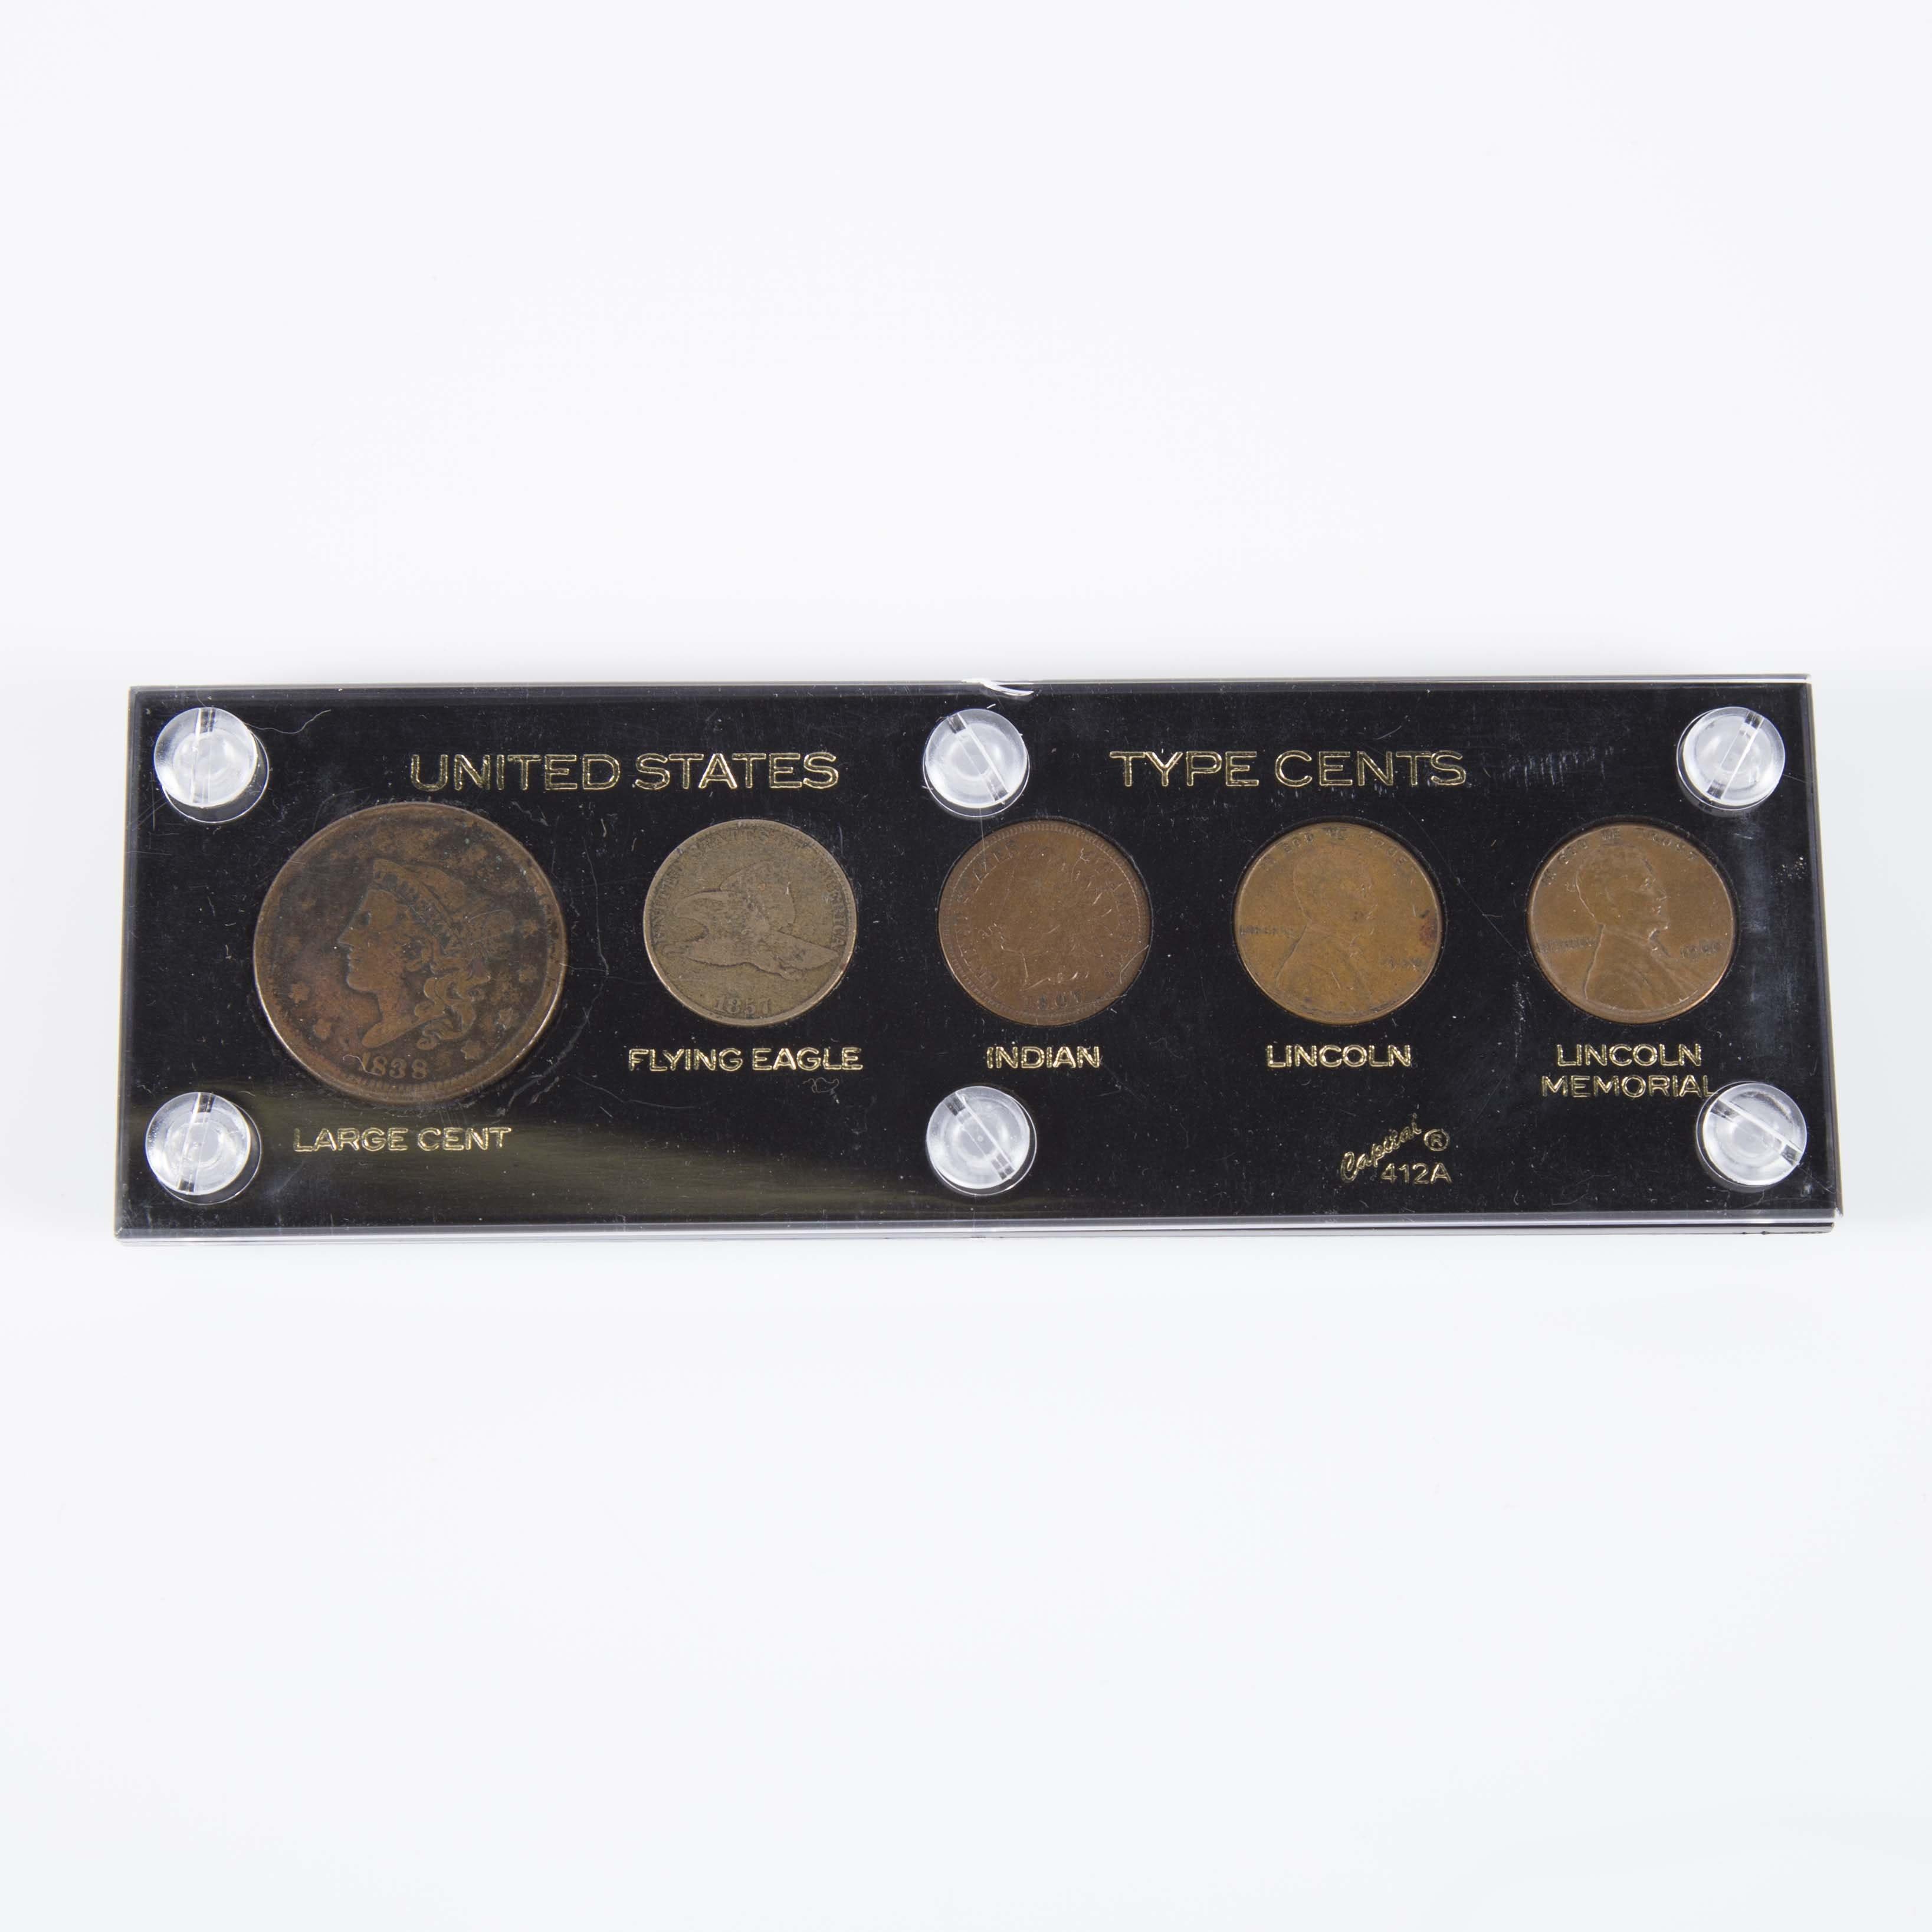 United States Type Cents